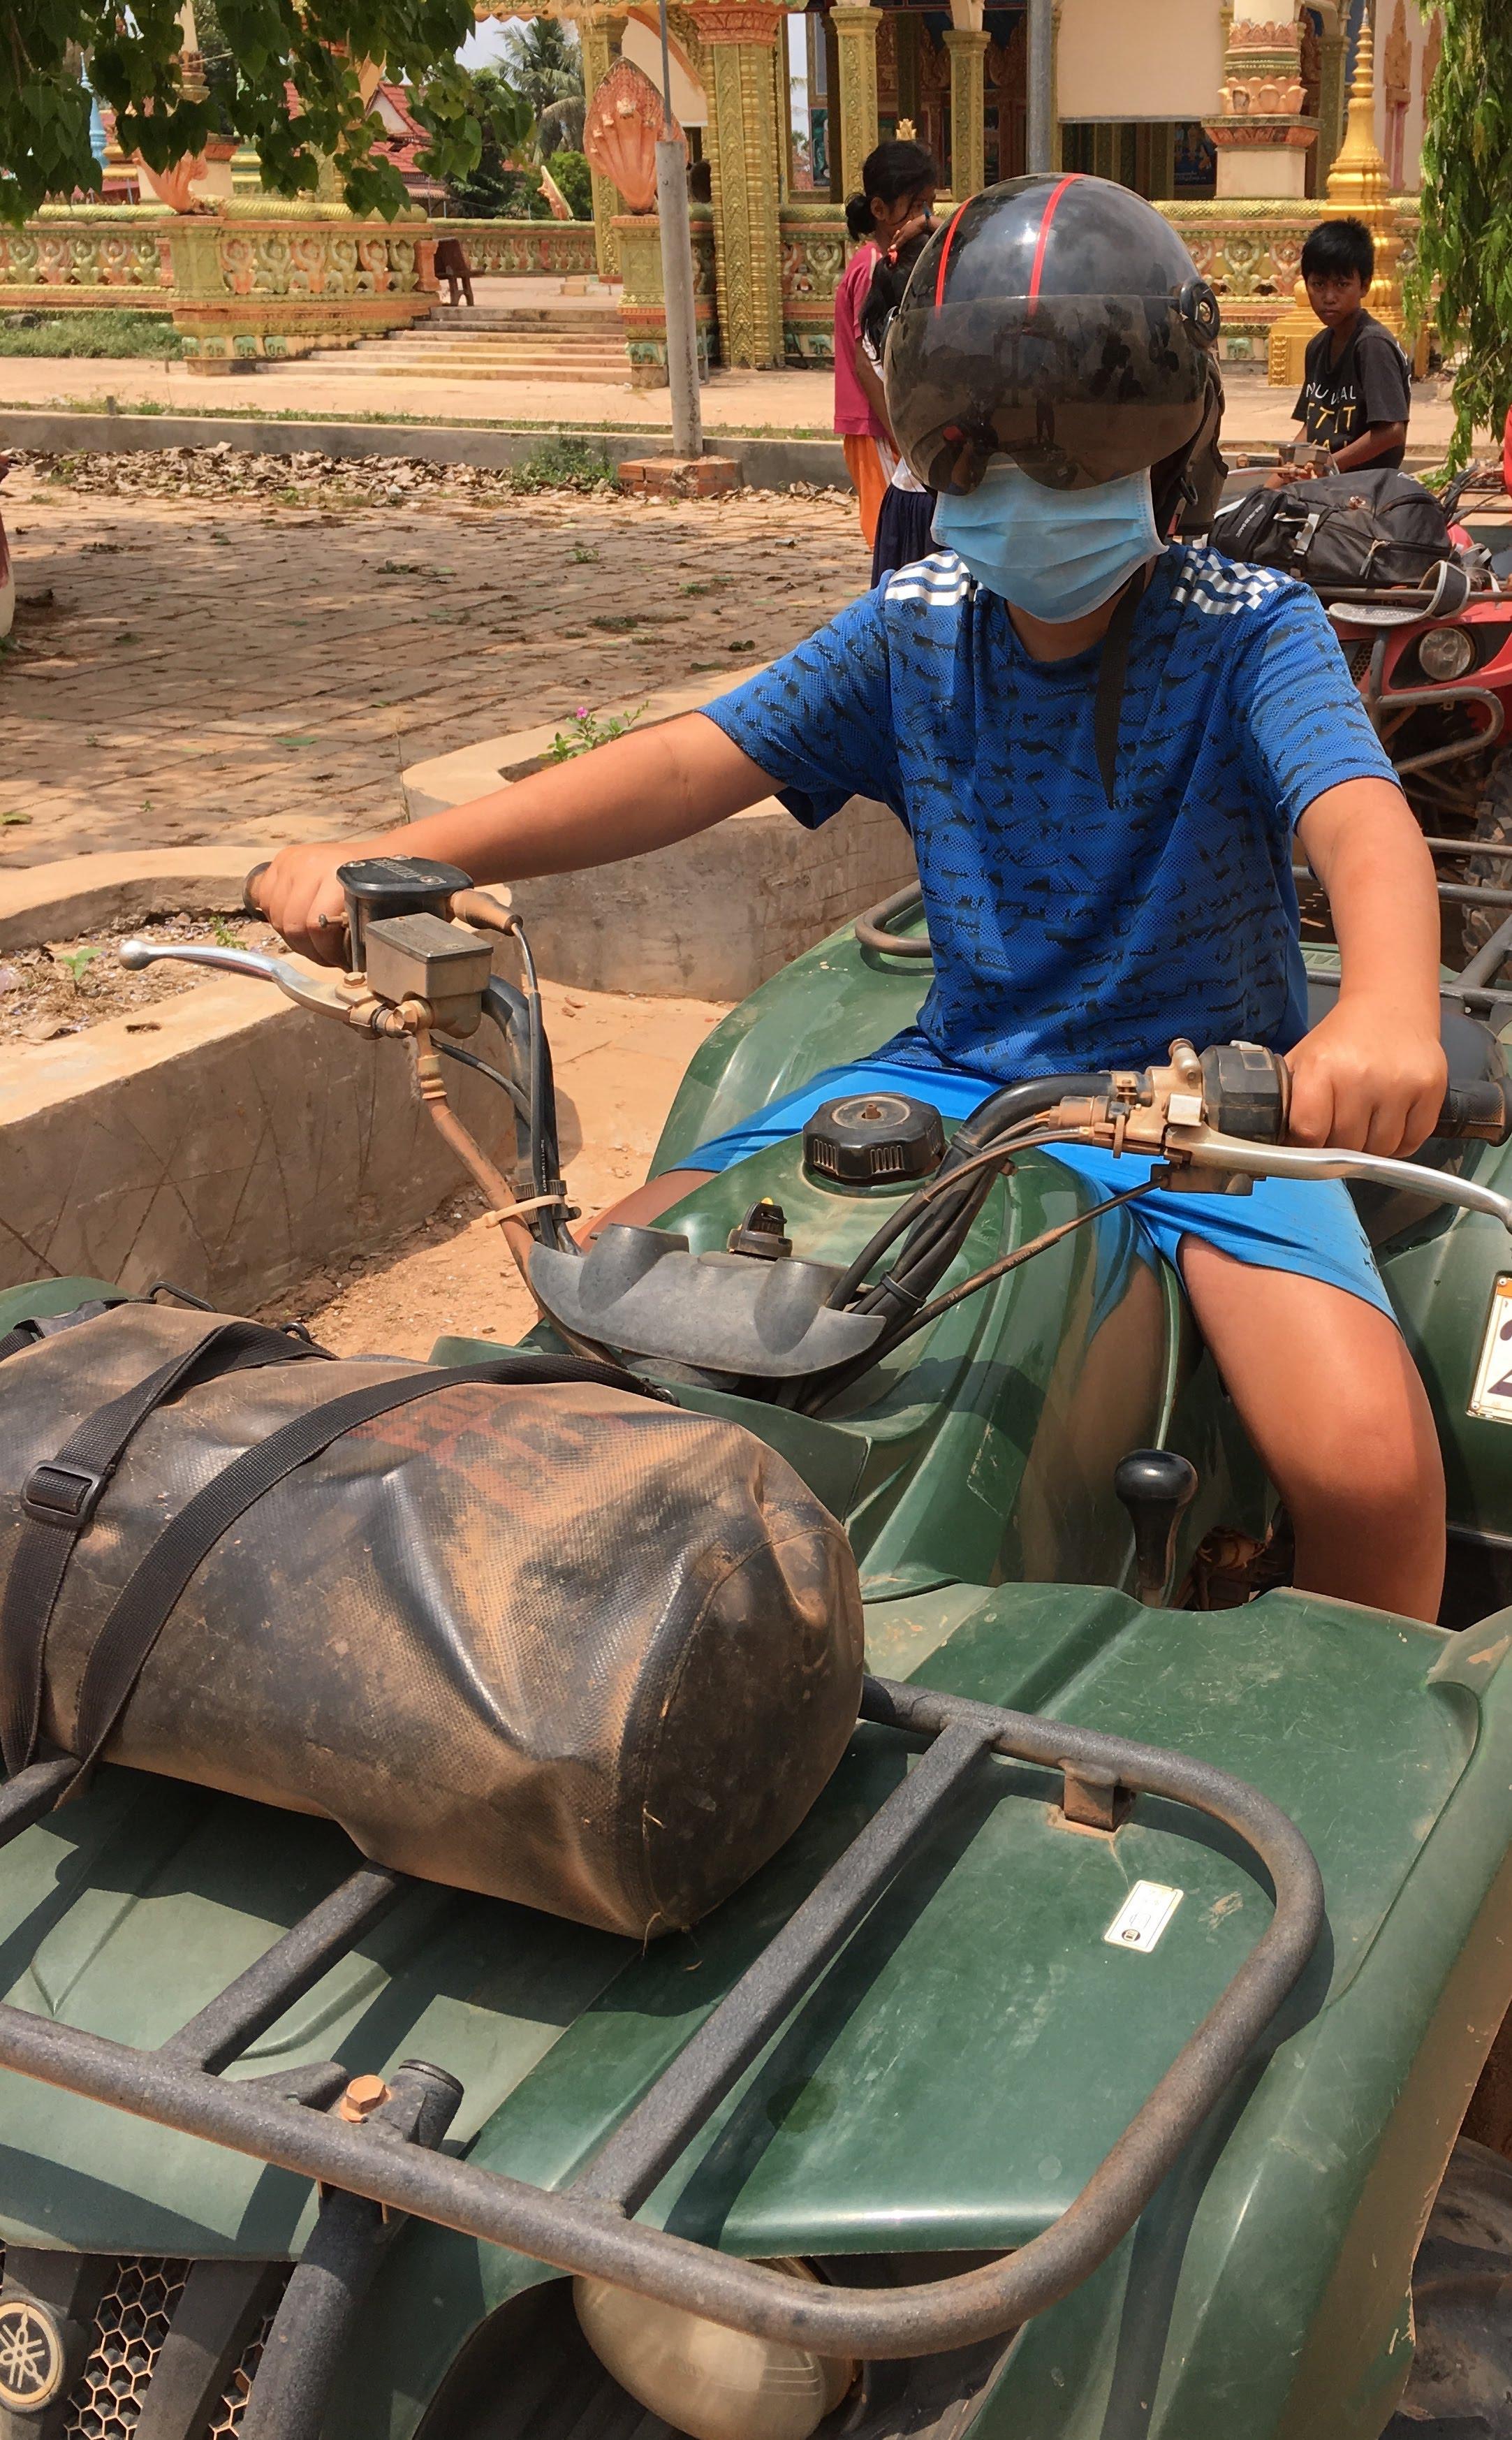 Cambodia — Off-road eventyr med børn